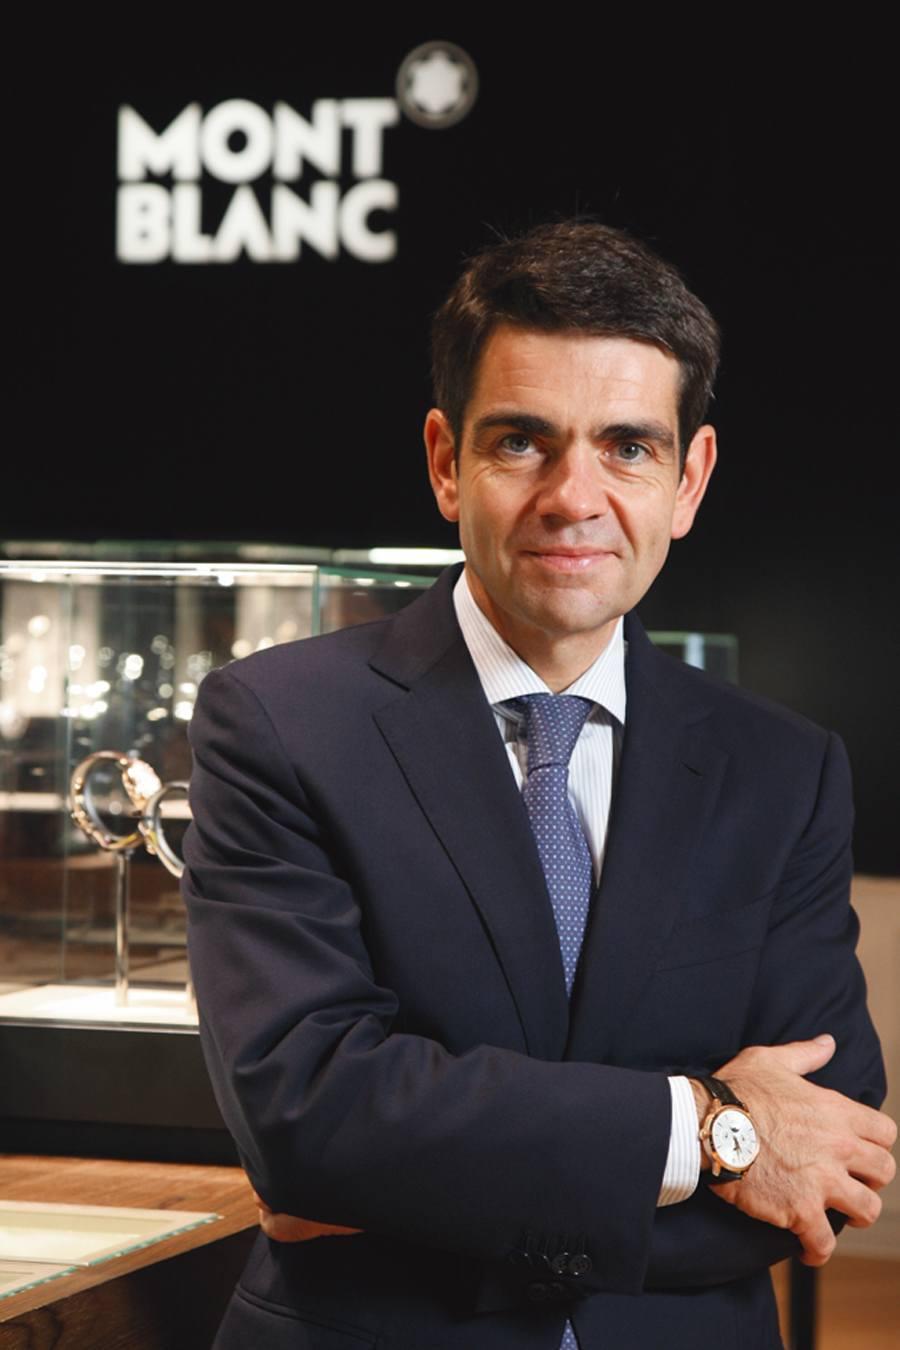 Montblanc-CEO Jérôme Lambert